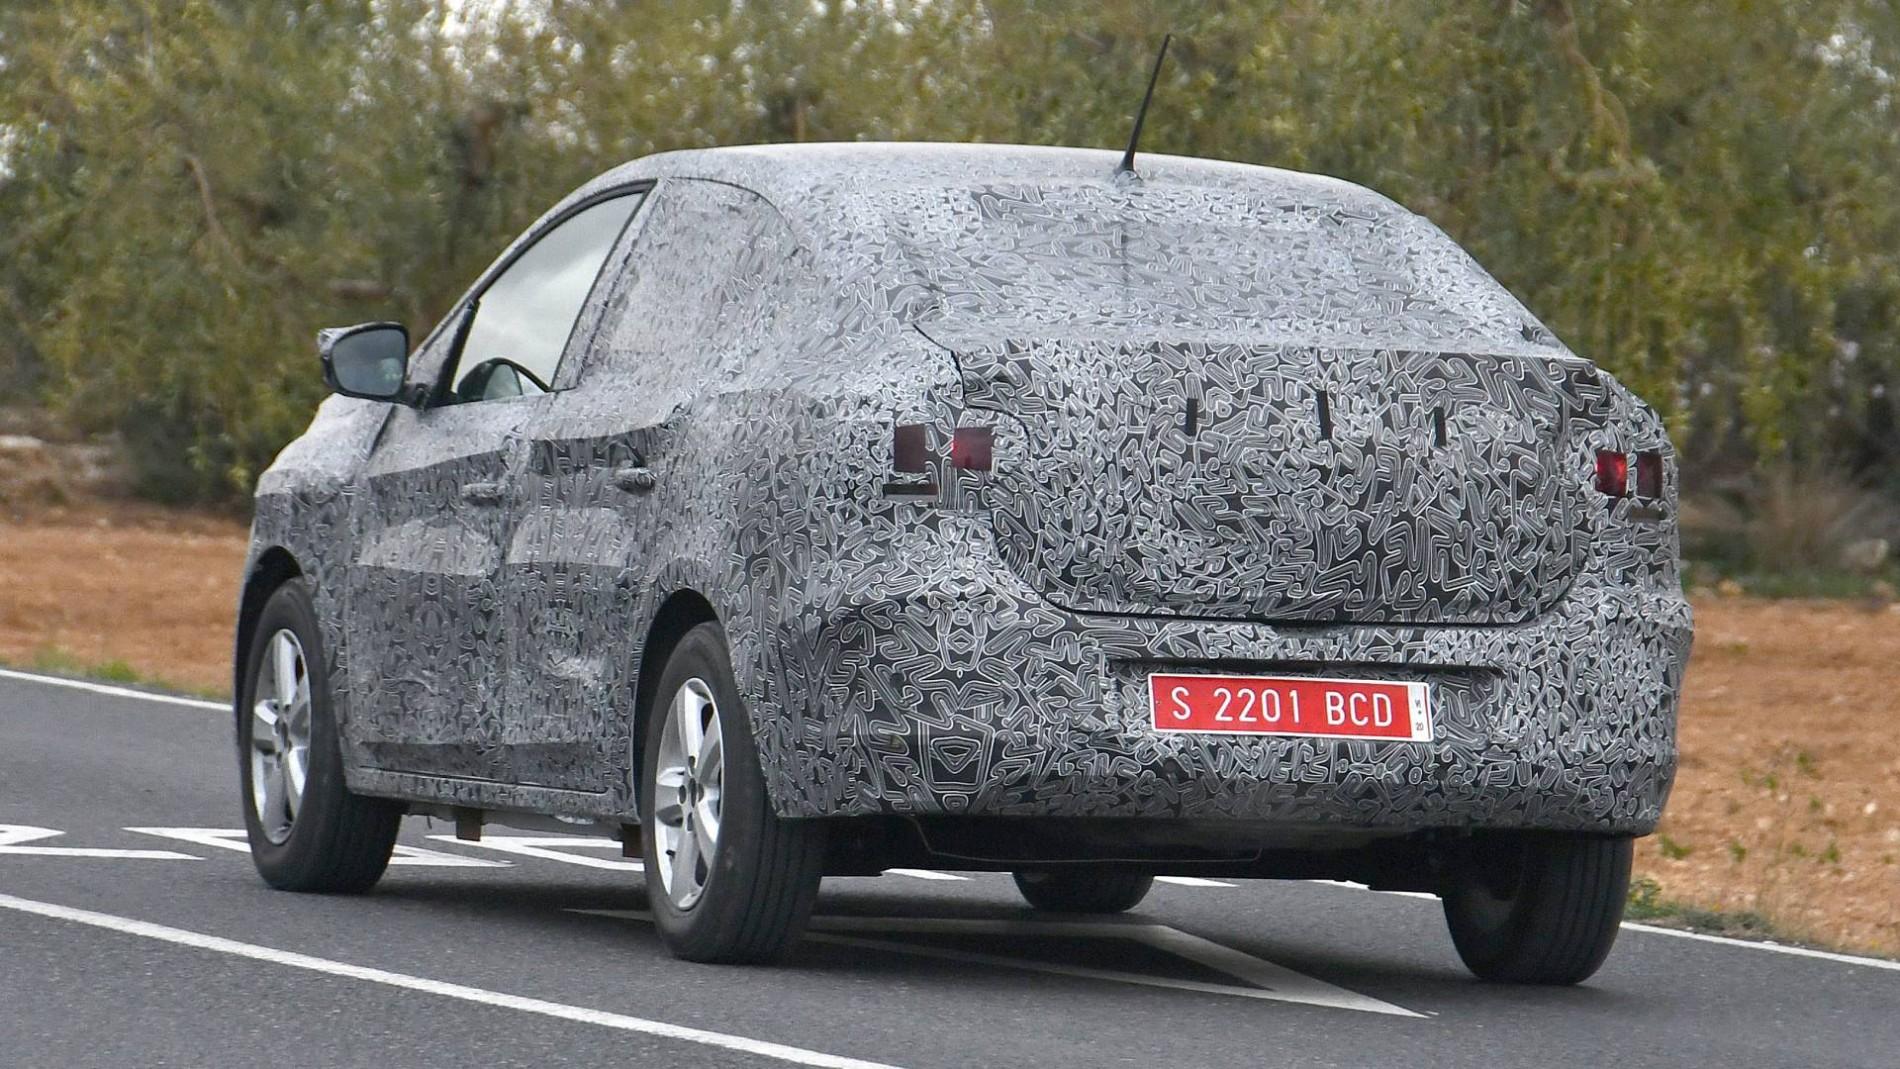 Dacia Logan 3 - Poze spion - Dacia Logan 3 - Poze spion